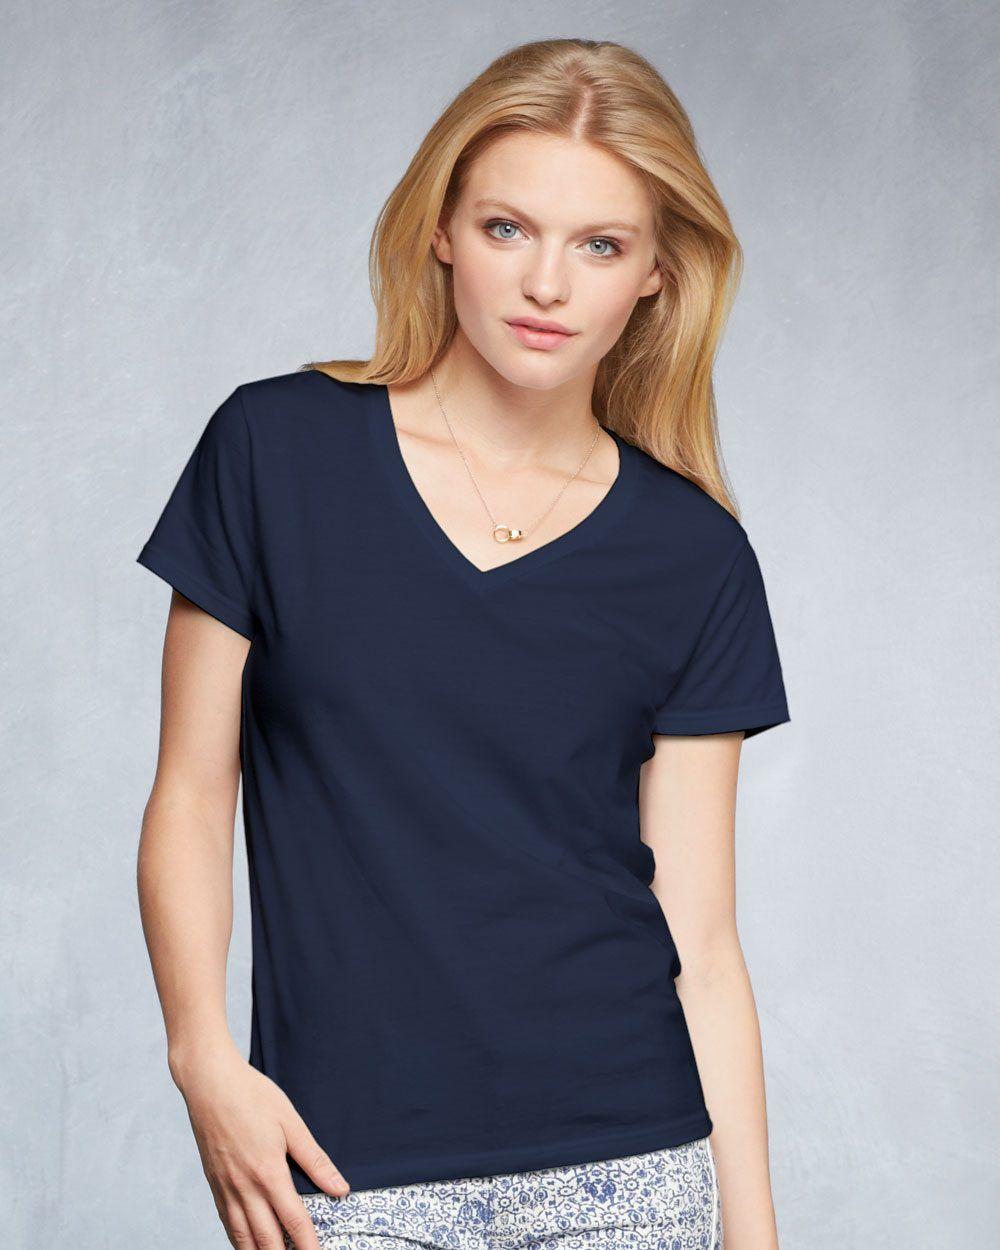 38953c07184 Anvil Missy Fit Ringspun V-Neck T-Shirt - 88VL  anvil  vnecktshirt   womenstshirt